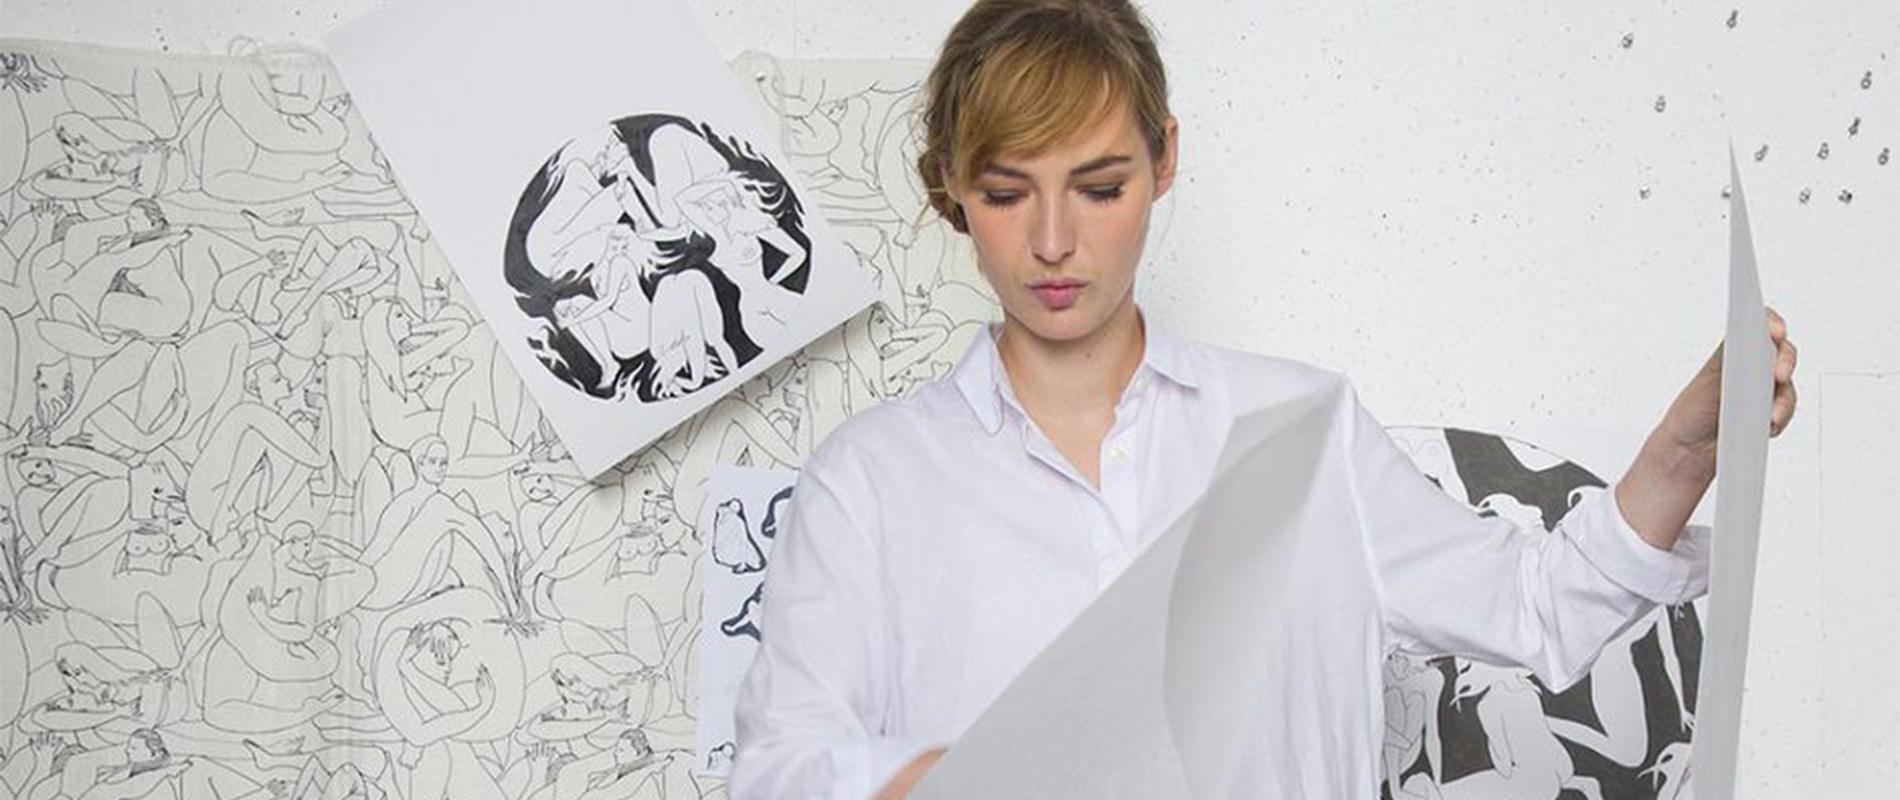 Papier Peint Pierre Frey louise bourgoin dessine du papier peint pour pierre frey